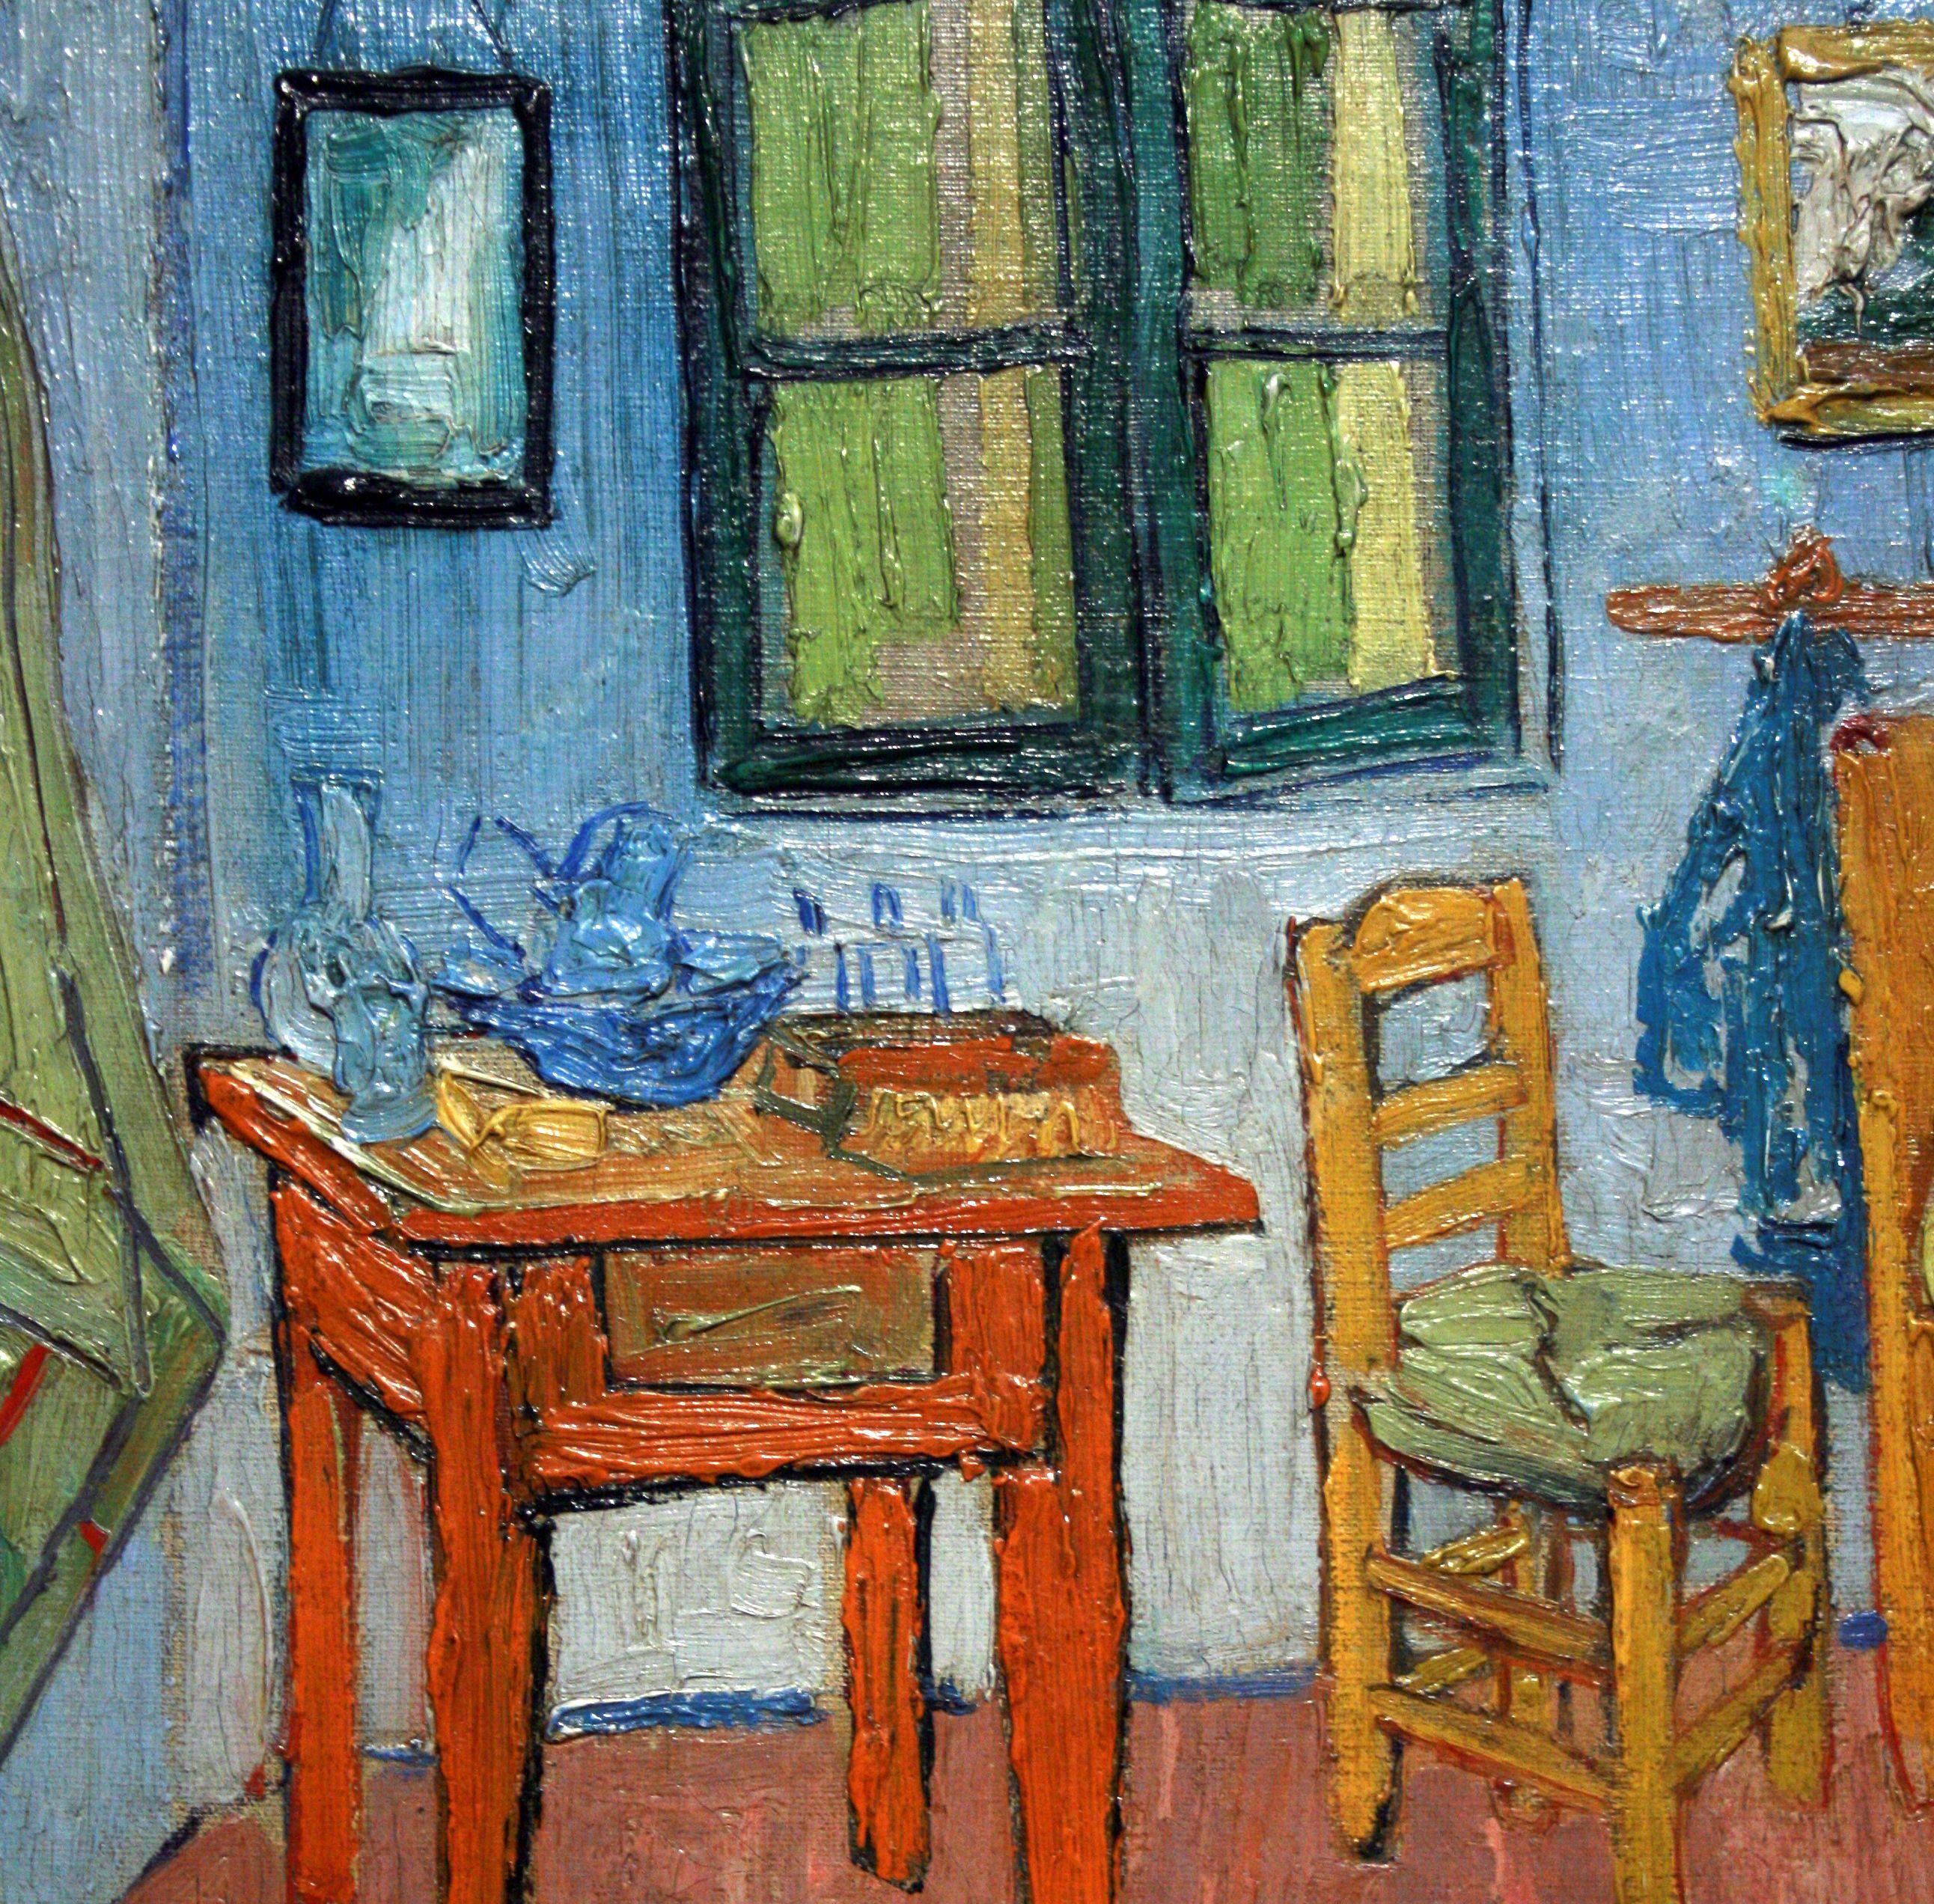 De slaapkamer\', 28%detail, Vincent van Gogh, | Vincent Van Gogh ...